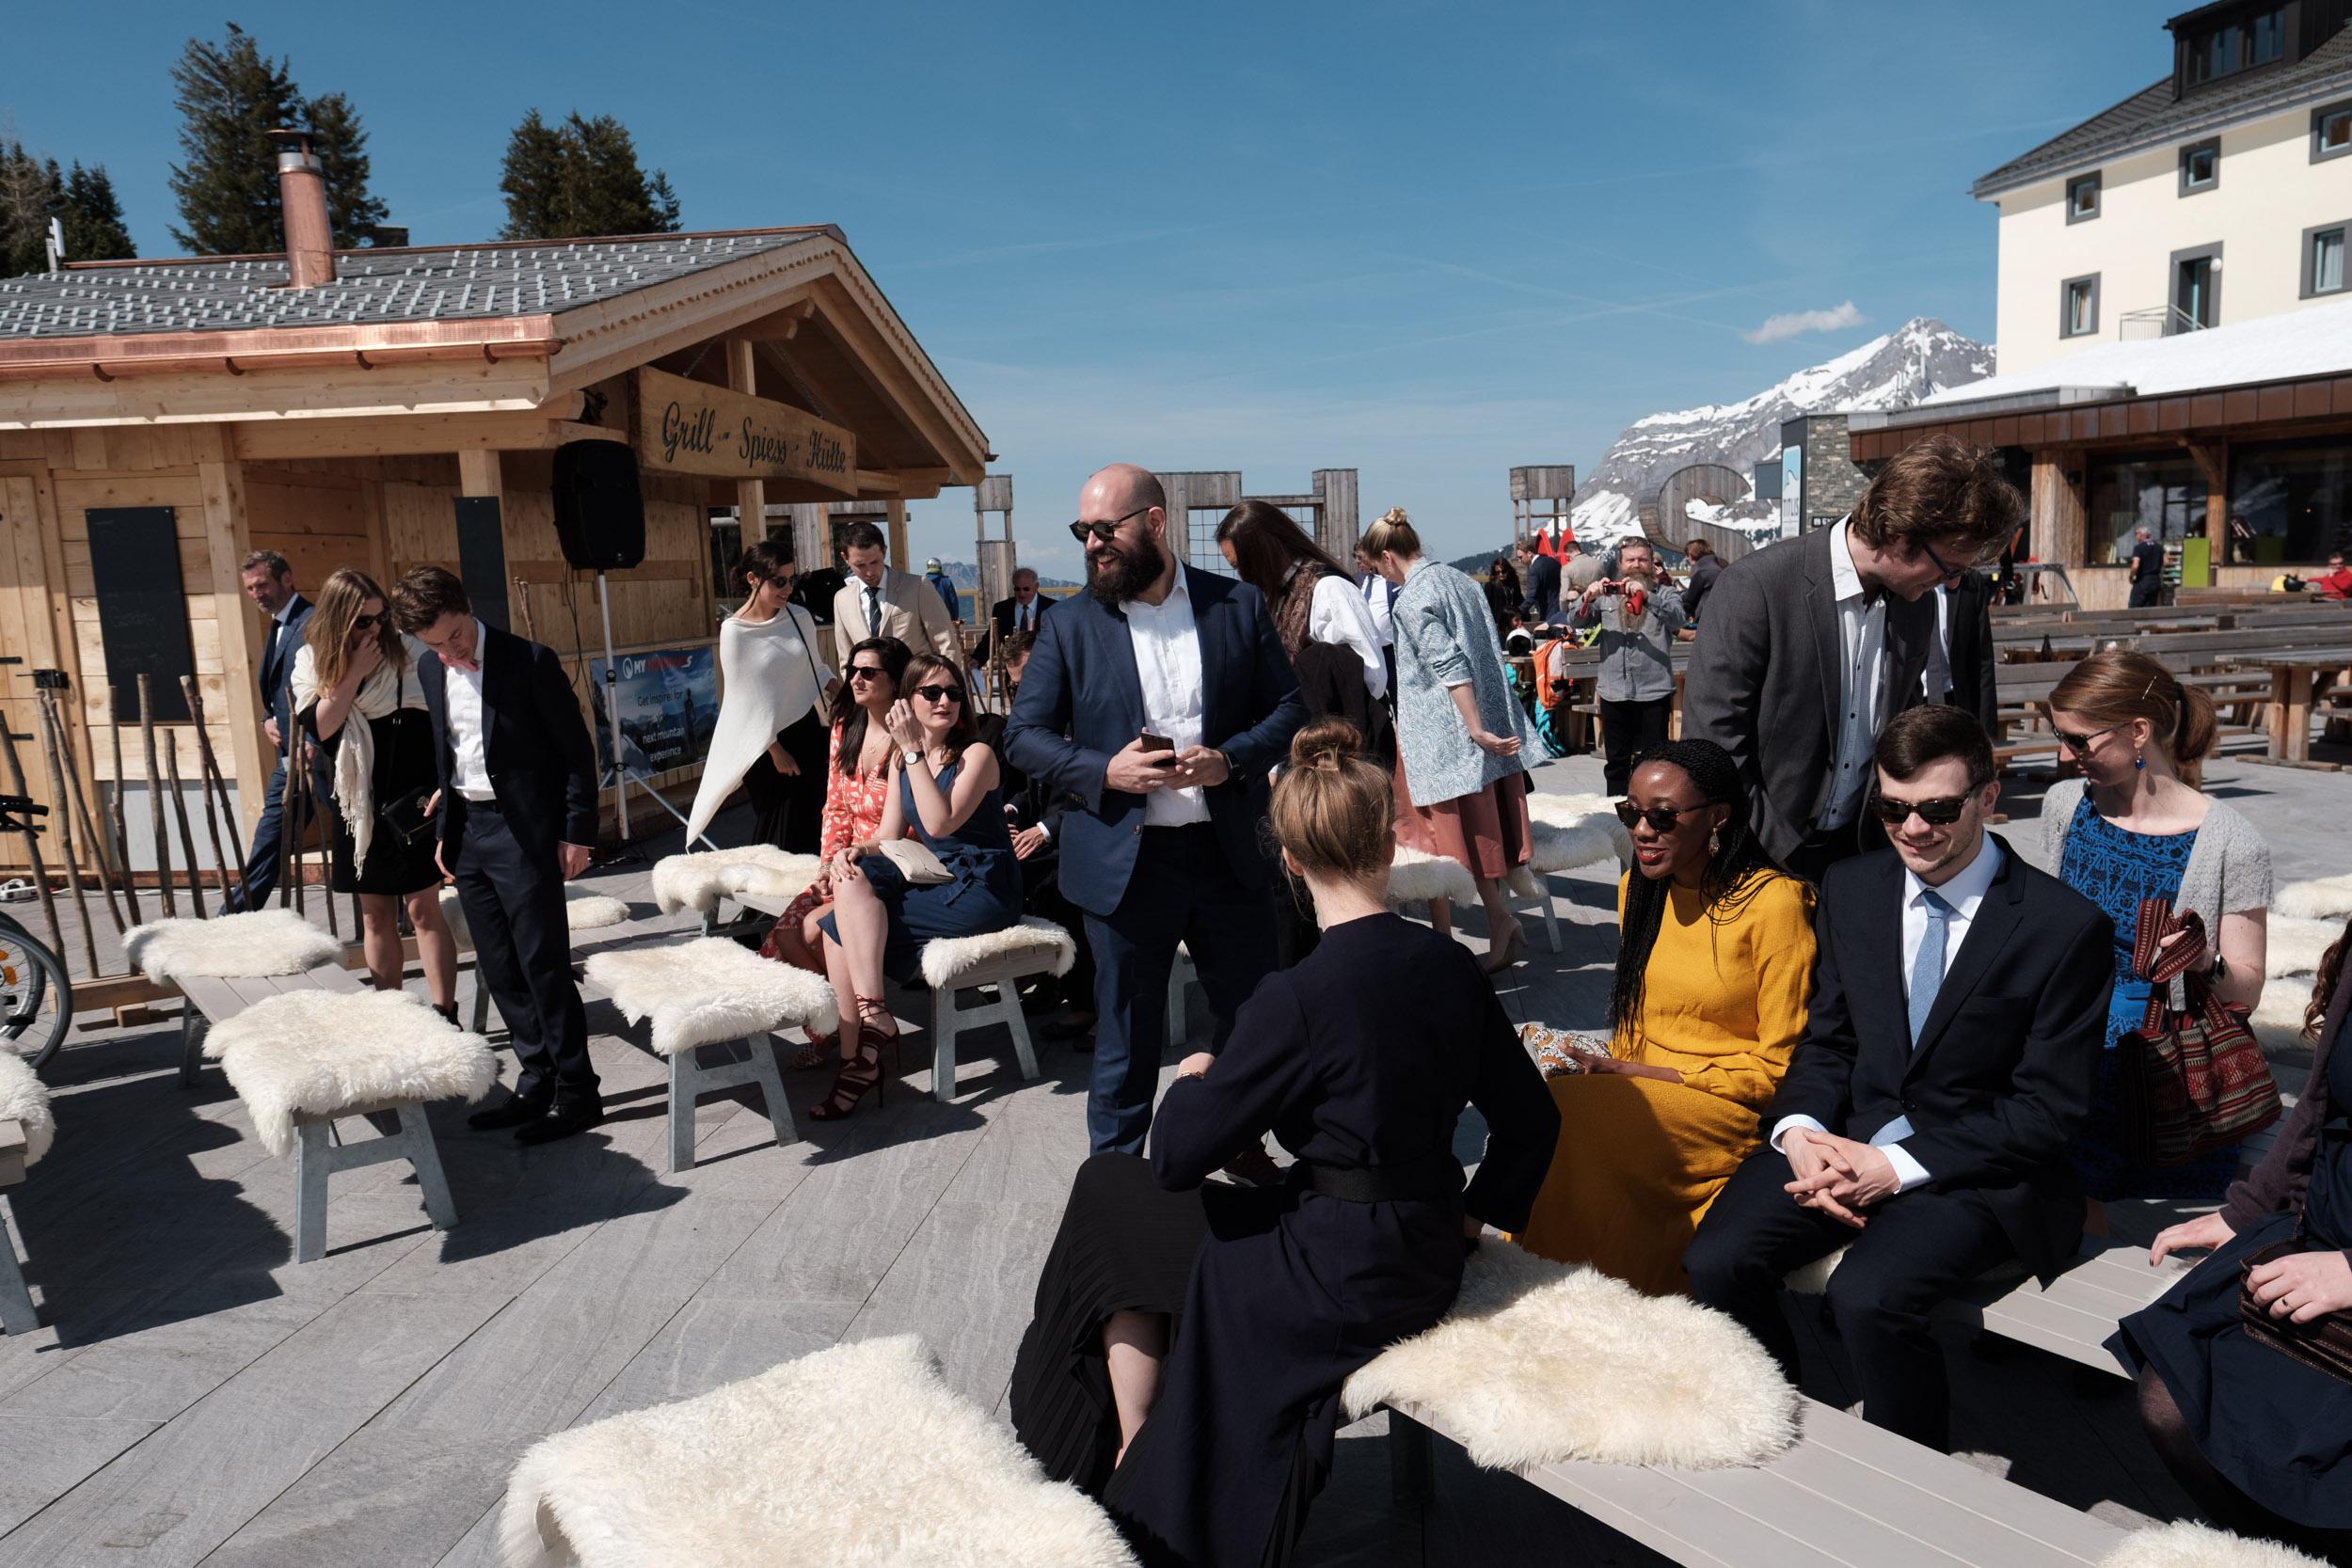 lynn-bastian-switzerland-wedding-photography-52.jpg